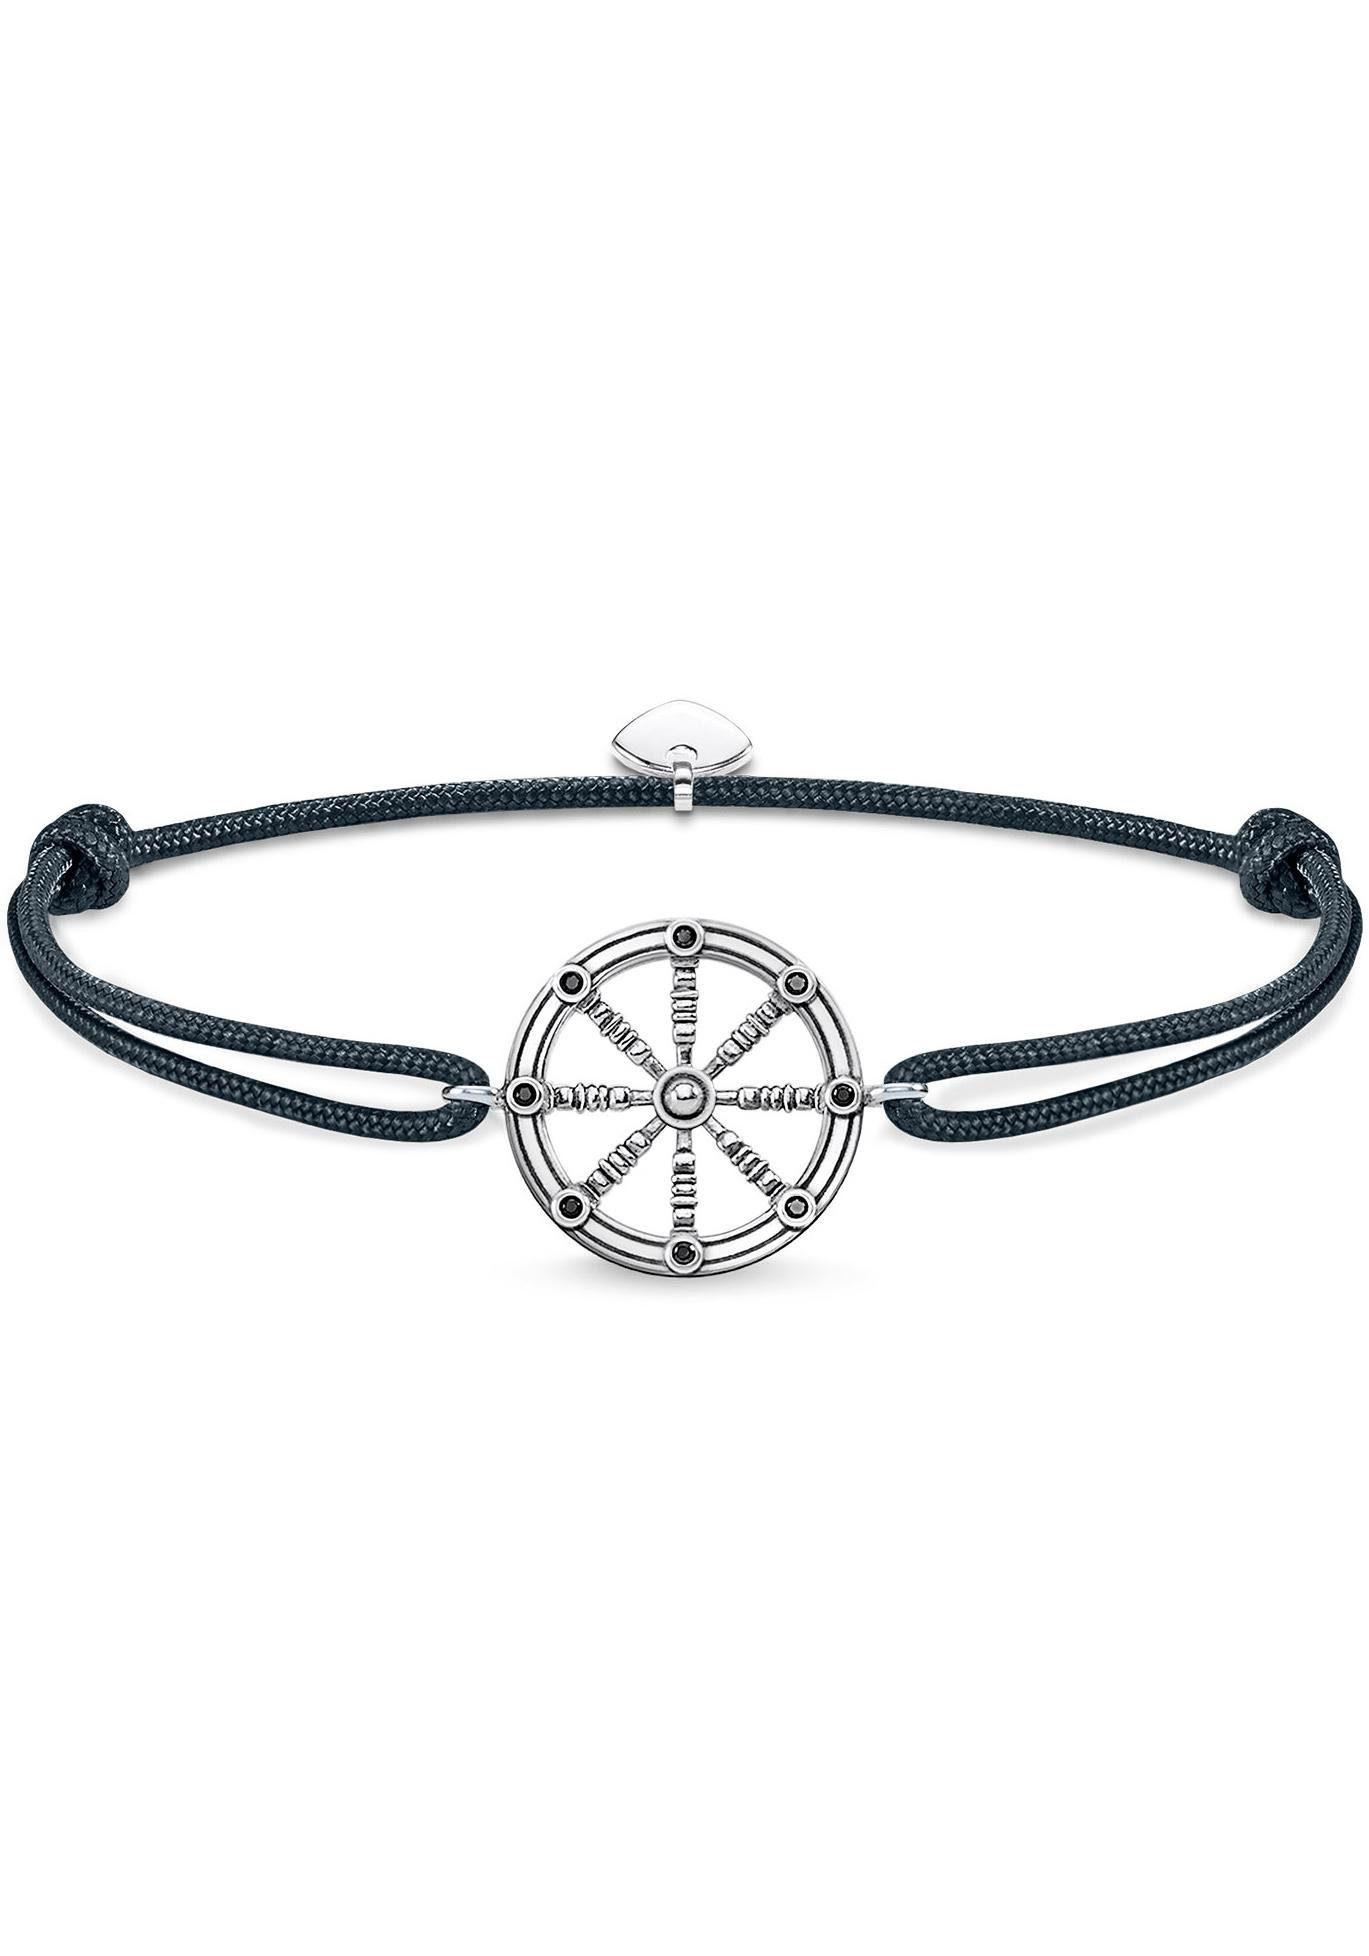 THOMAS SABO Armband »Little Secret Karma Wheel, LS064-889-5-L22v«, mit Zirkonia